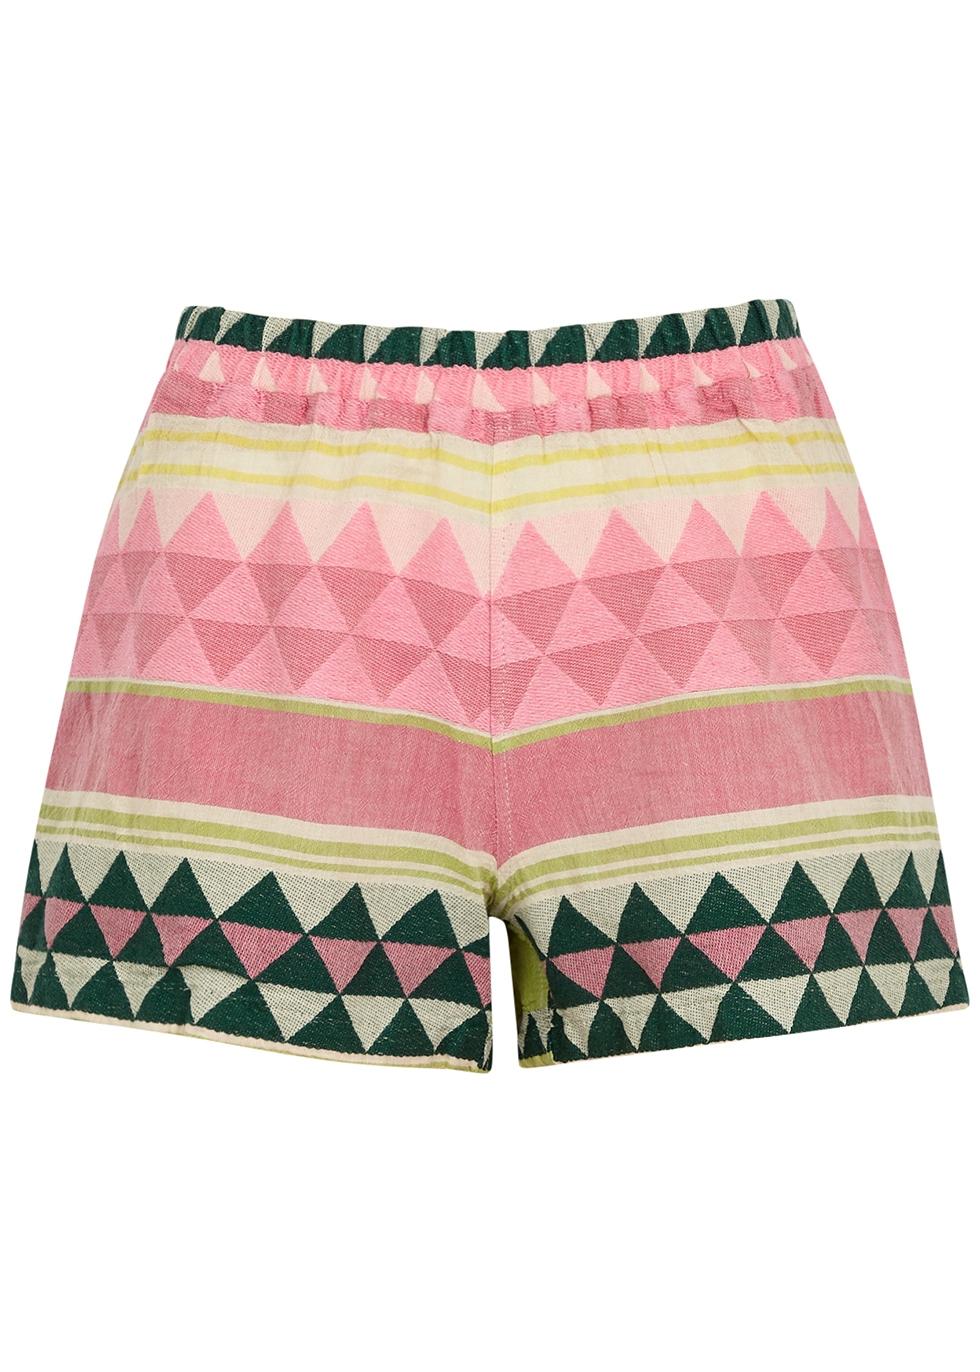 Zakar embroidered cotton shorts